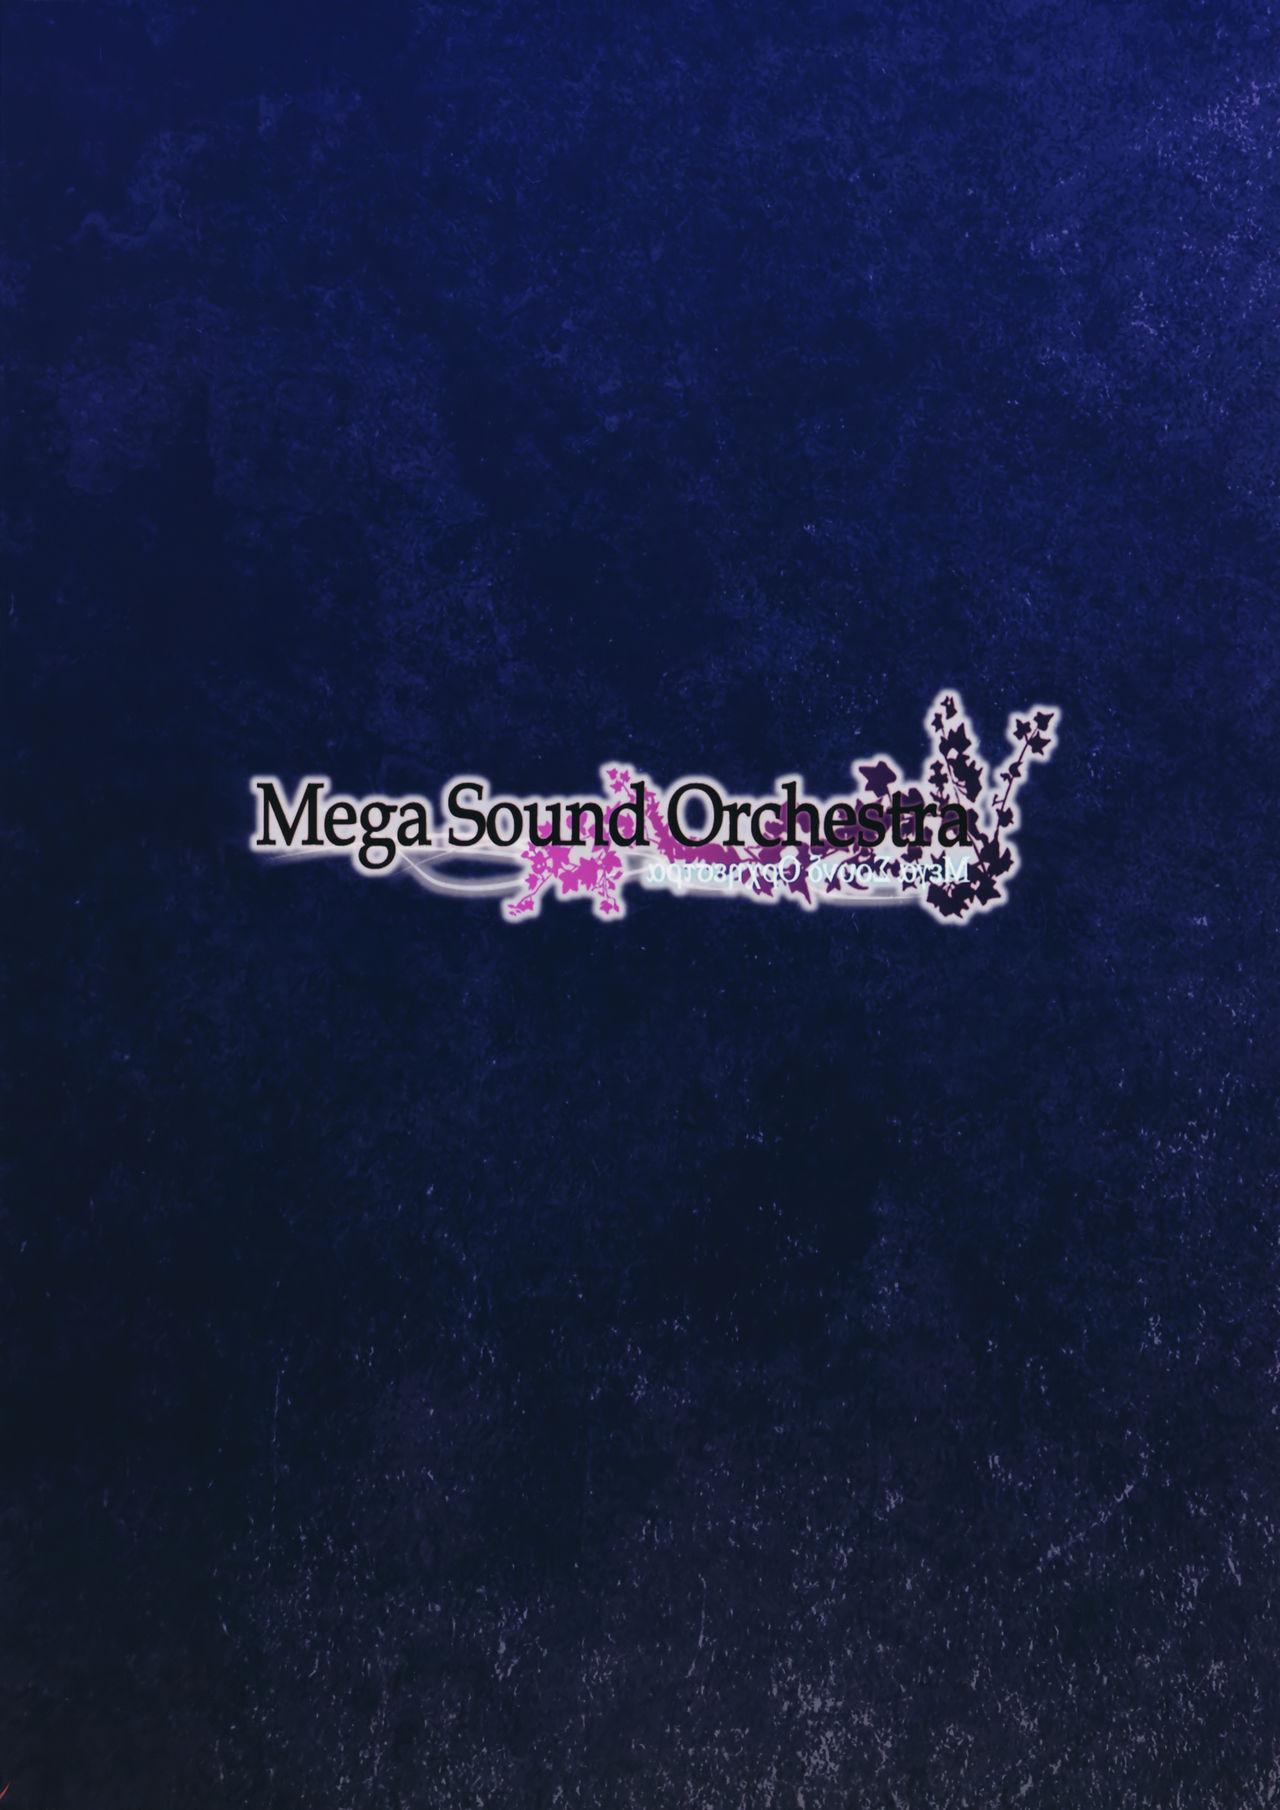 (C91) [MegaSoundOrchestra (Sanwaribiki)] Gensou Enkou -Flandre- Shoku (Touhou Project) [English] [SMDC] 26